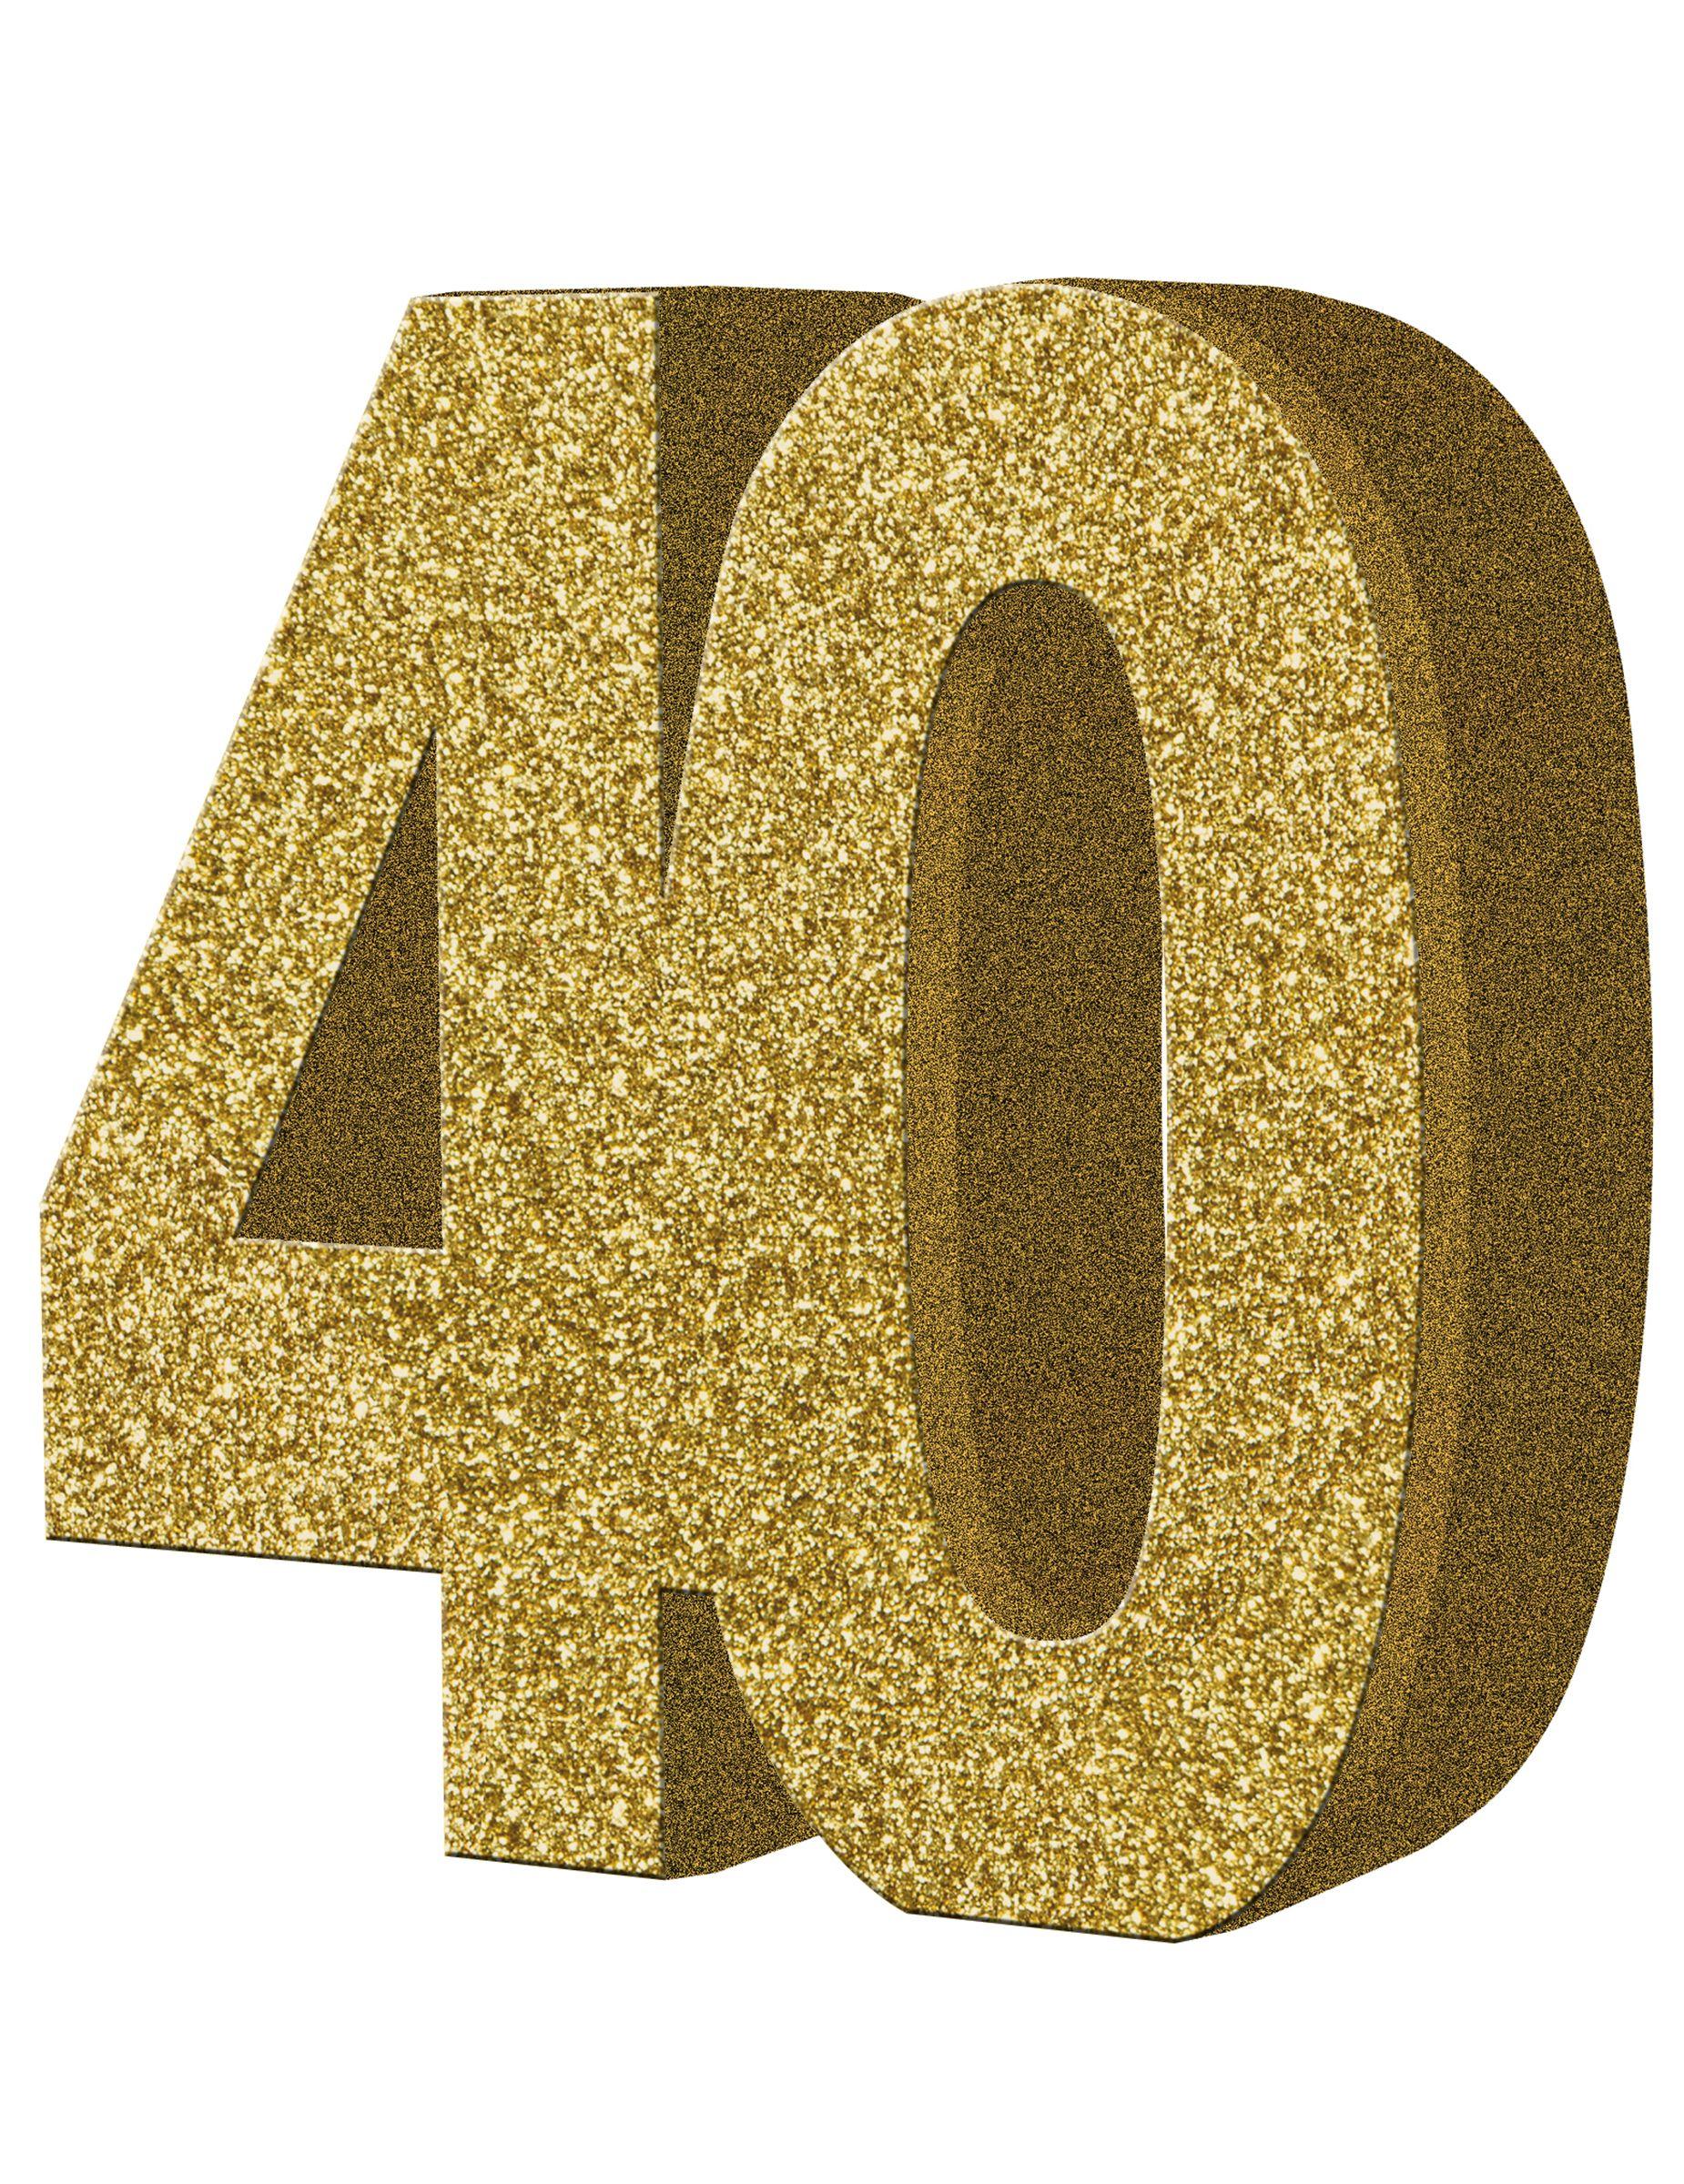 Decoraci n de mesa 40 a os cumplea os 40 decoraciones for Decoracion 40